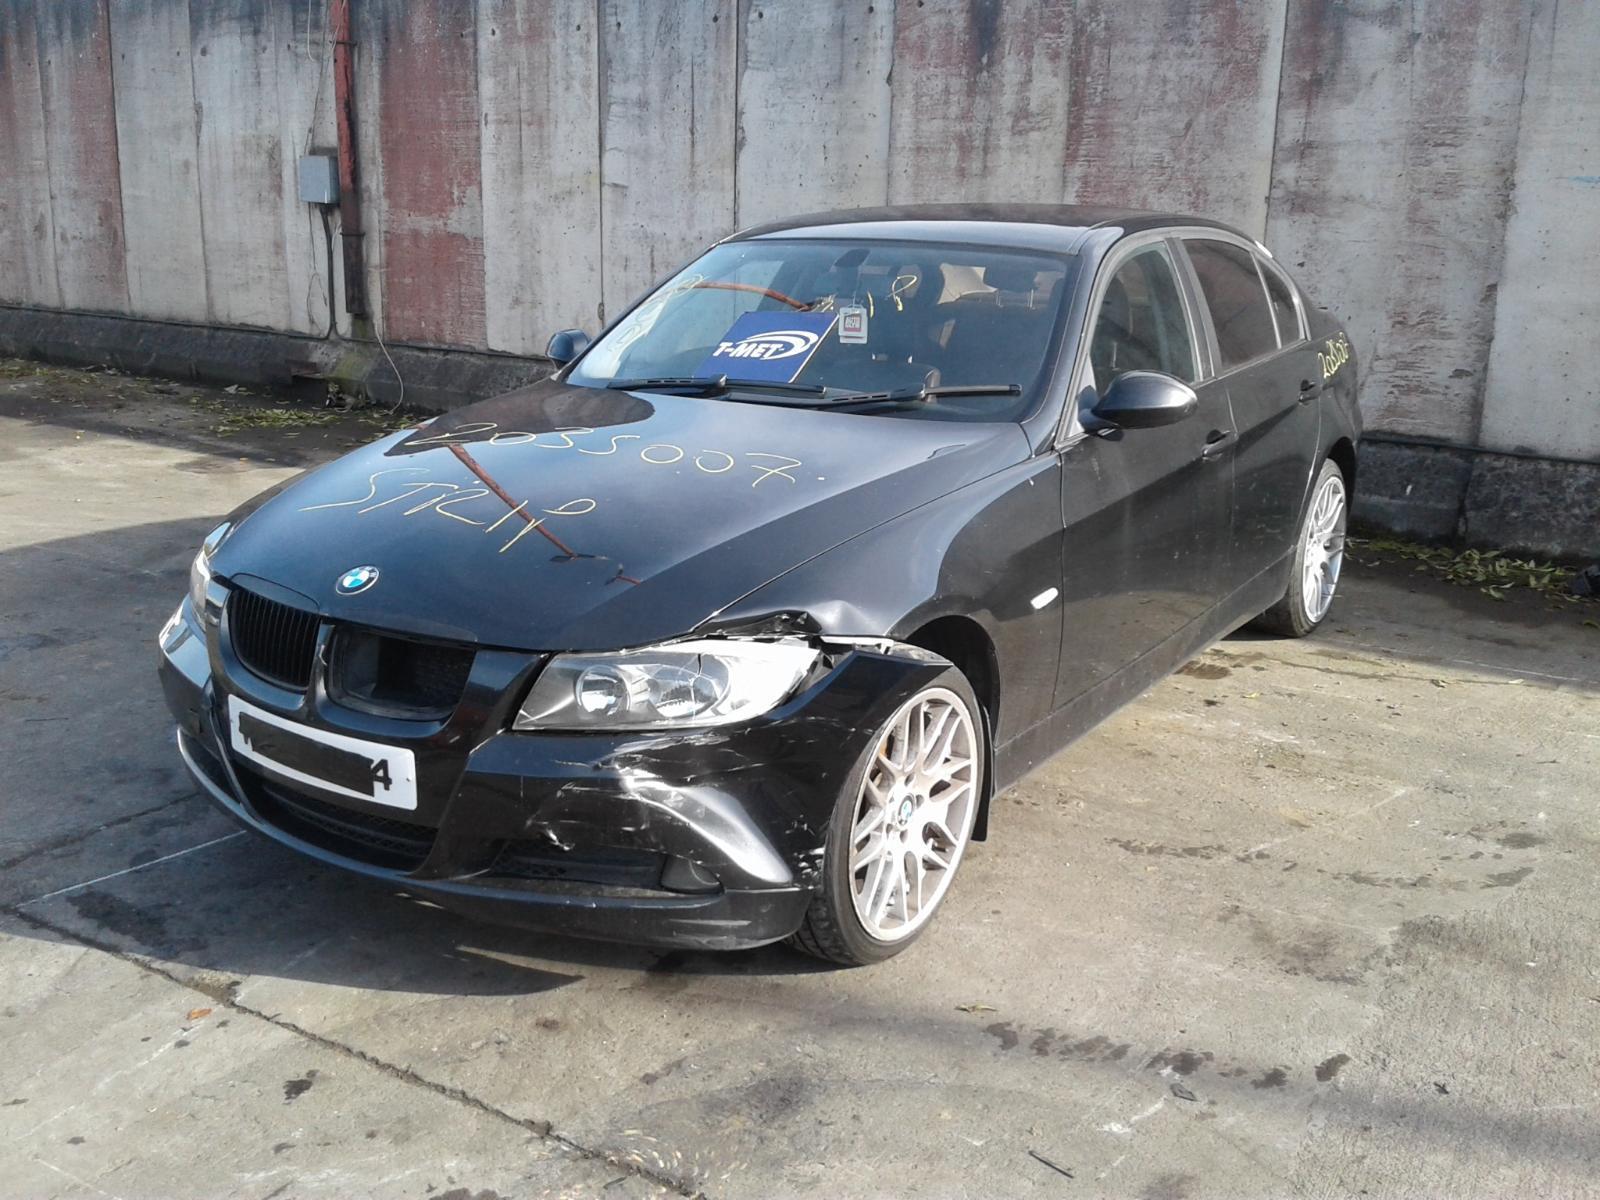 20045 BMW 3 SERIESN Image